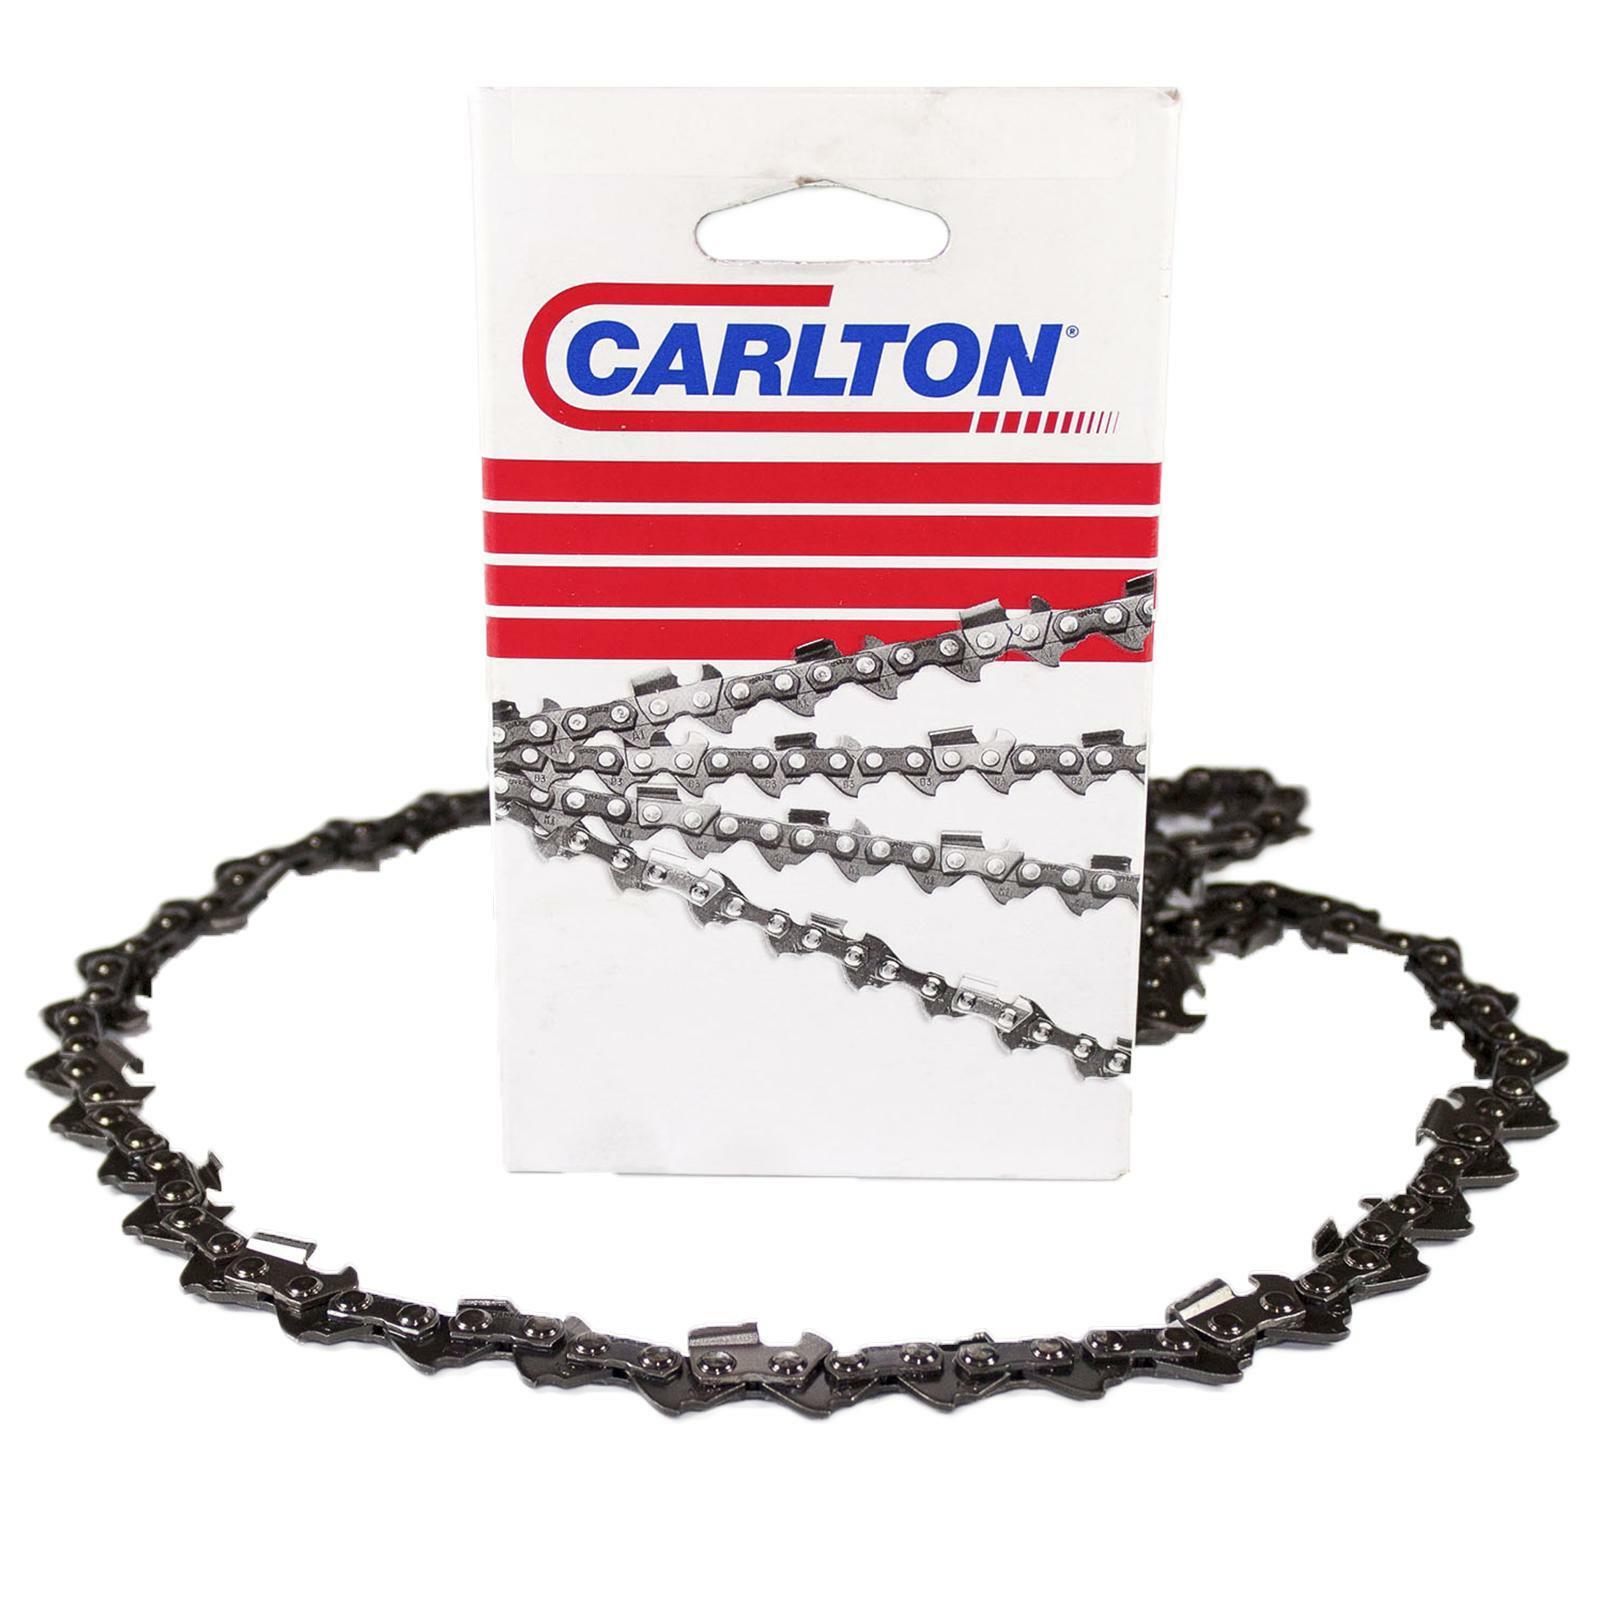 carlton catena per motosega carlton 3/8 sp 1.3 cm 25 40 maglie